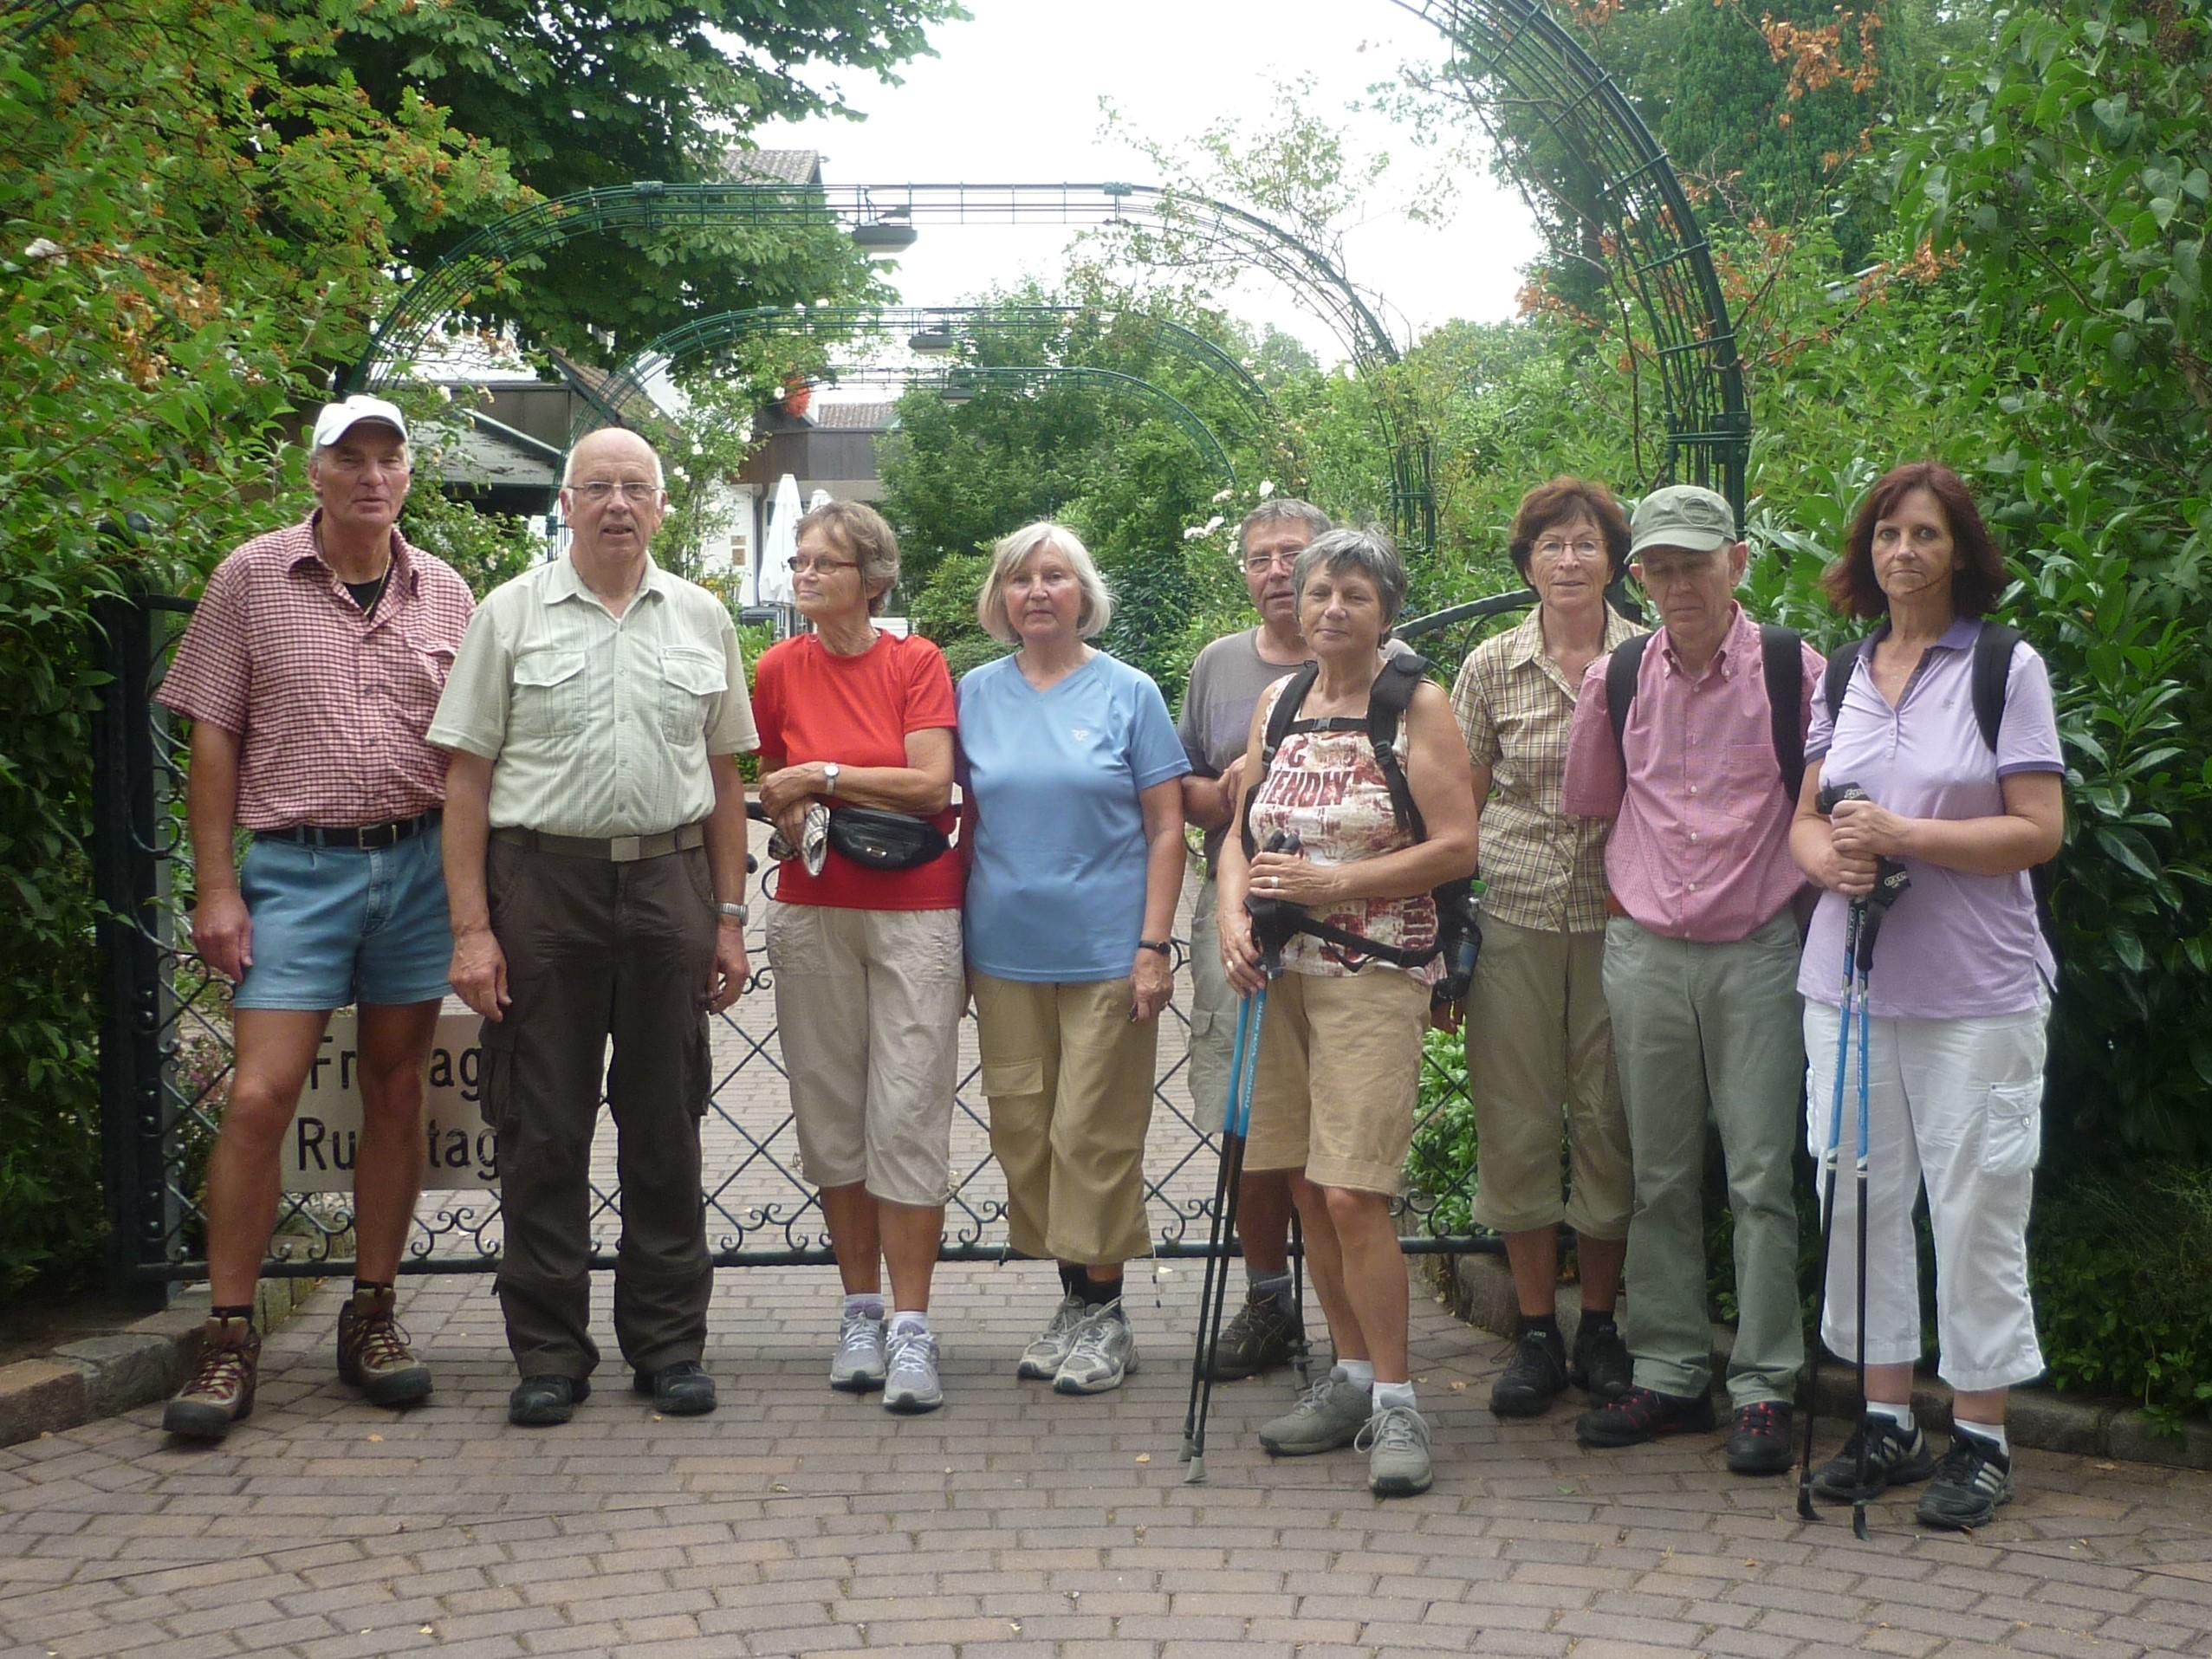 64 Senioren Wandern Im Oktober 2016